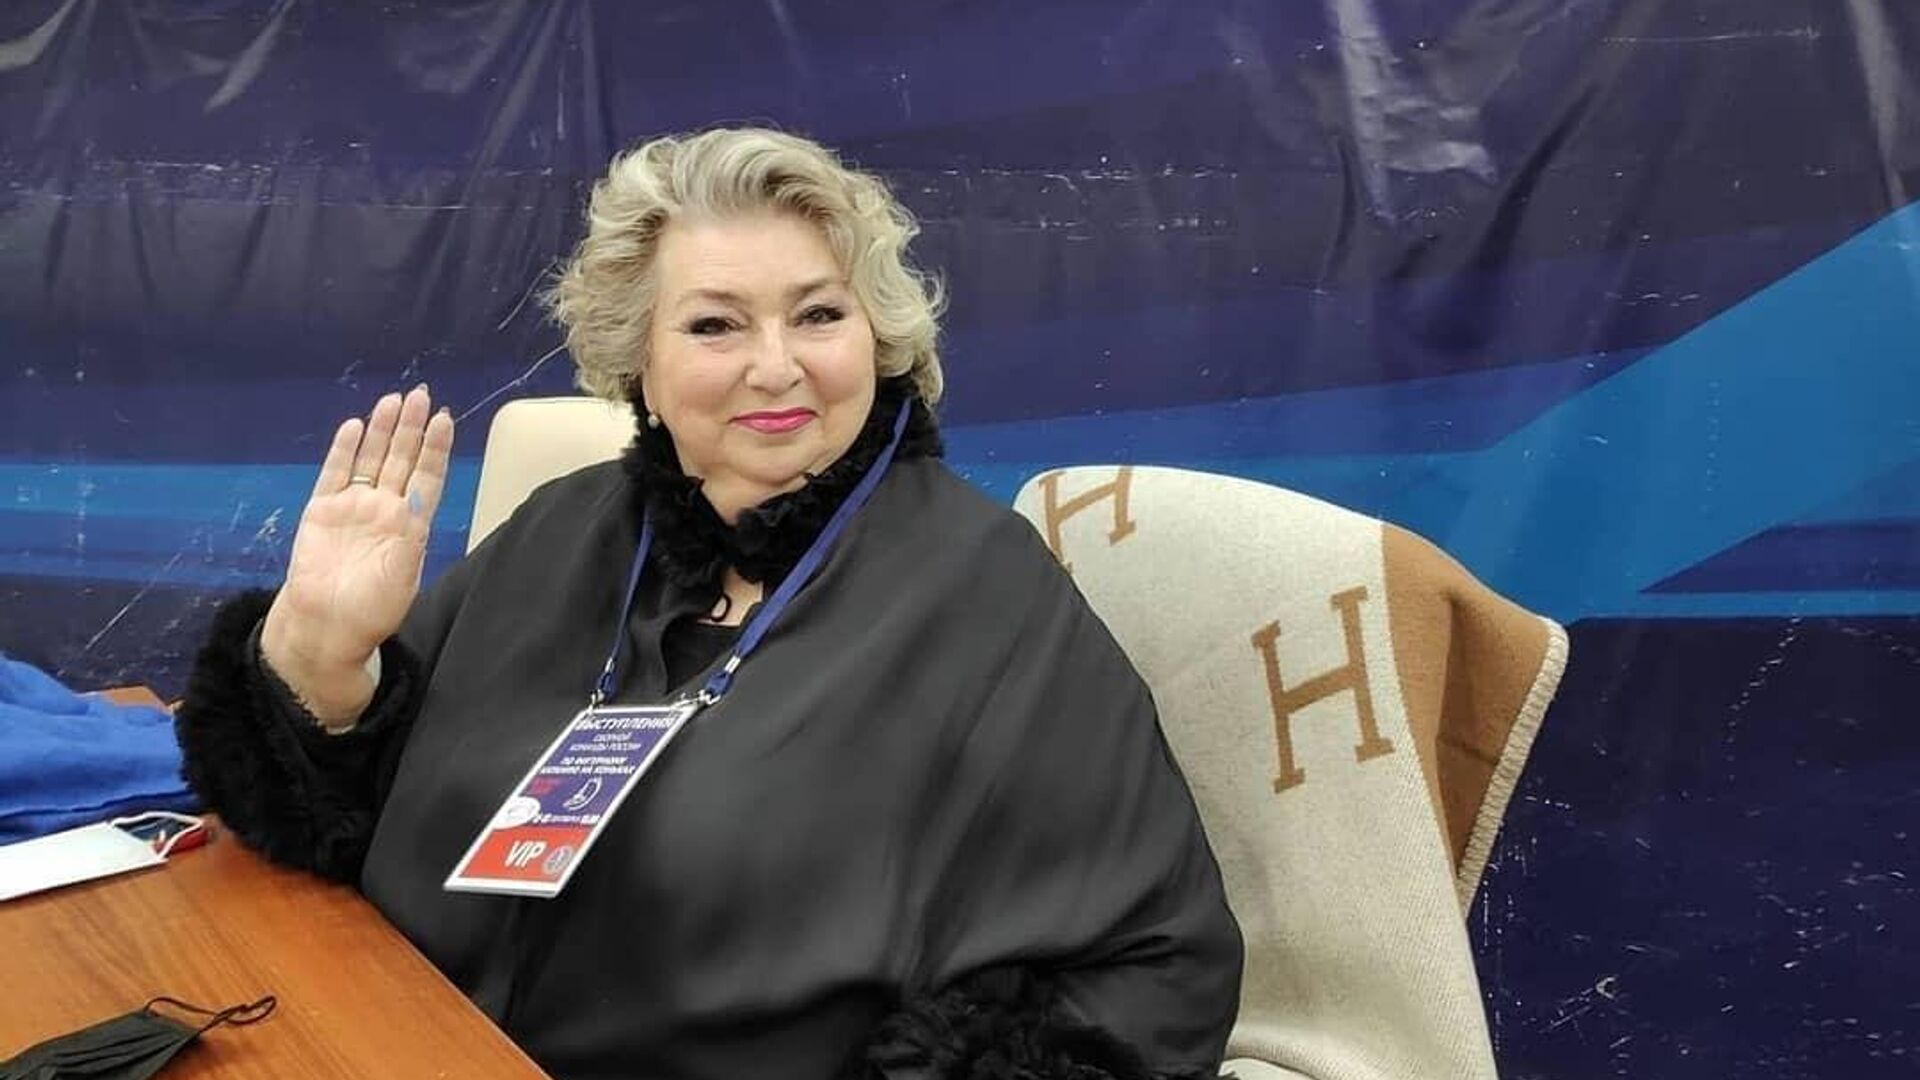 Заслуженный тренер СССР Татьяна Тарасова - РИА Новости, 1920, 02.08.2021